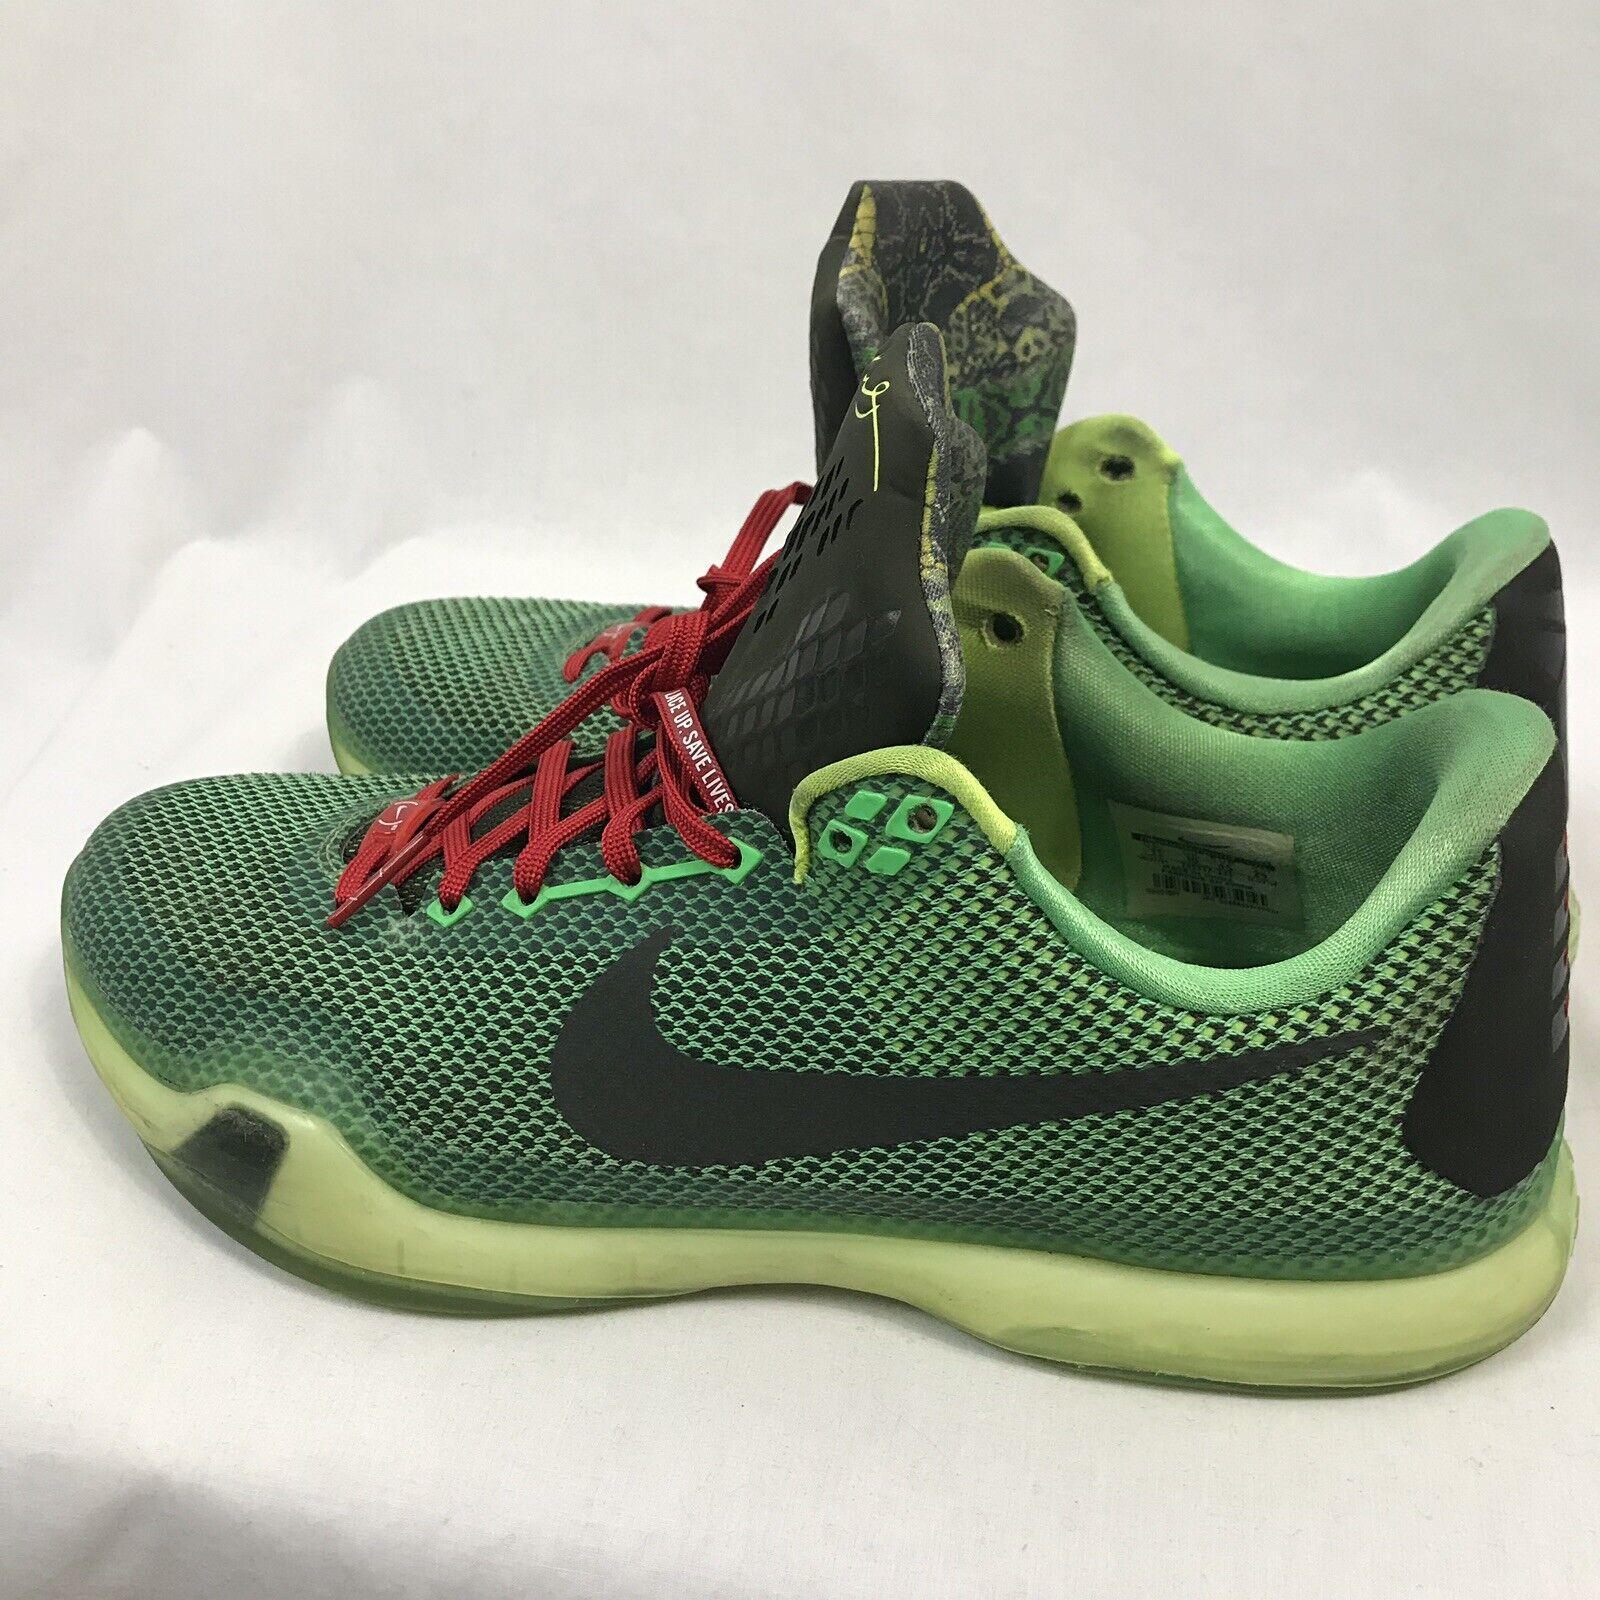 Nike Kobe 10  Vino  Zapatillas Baloncesto, Hombre Talla 11 , 705317-333